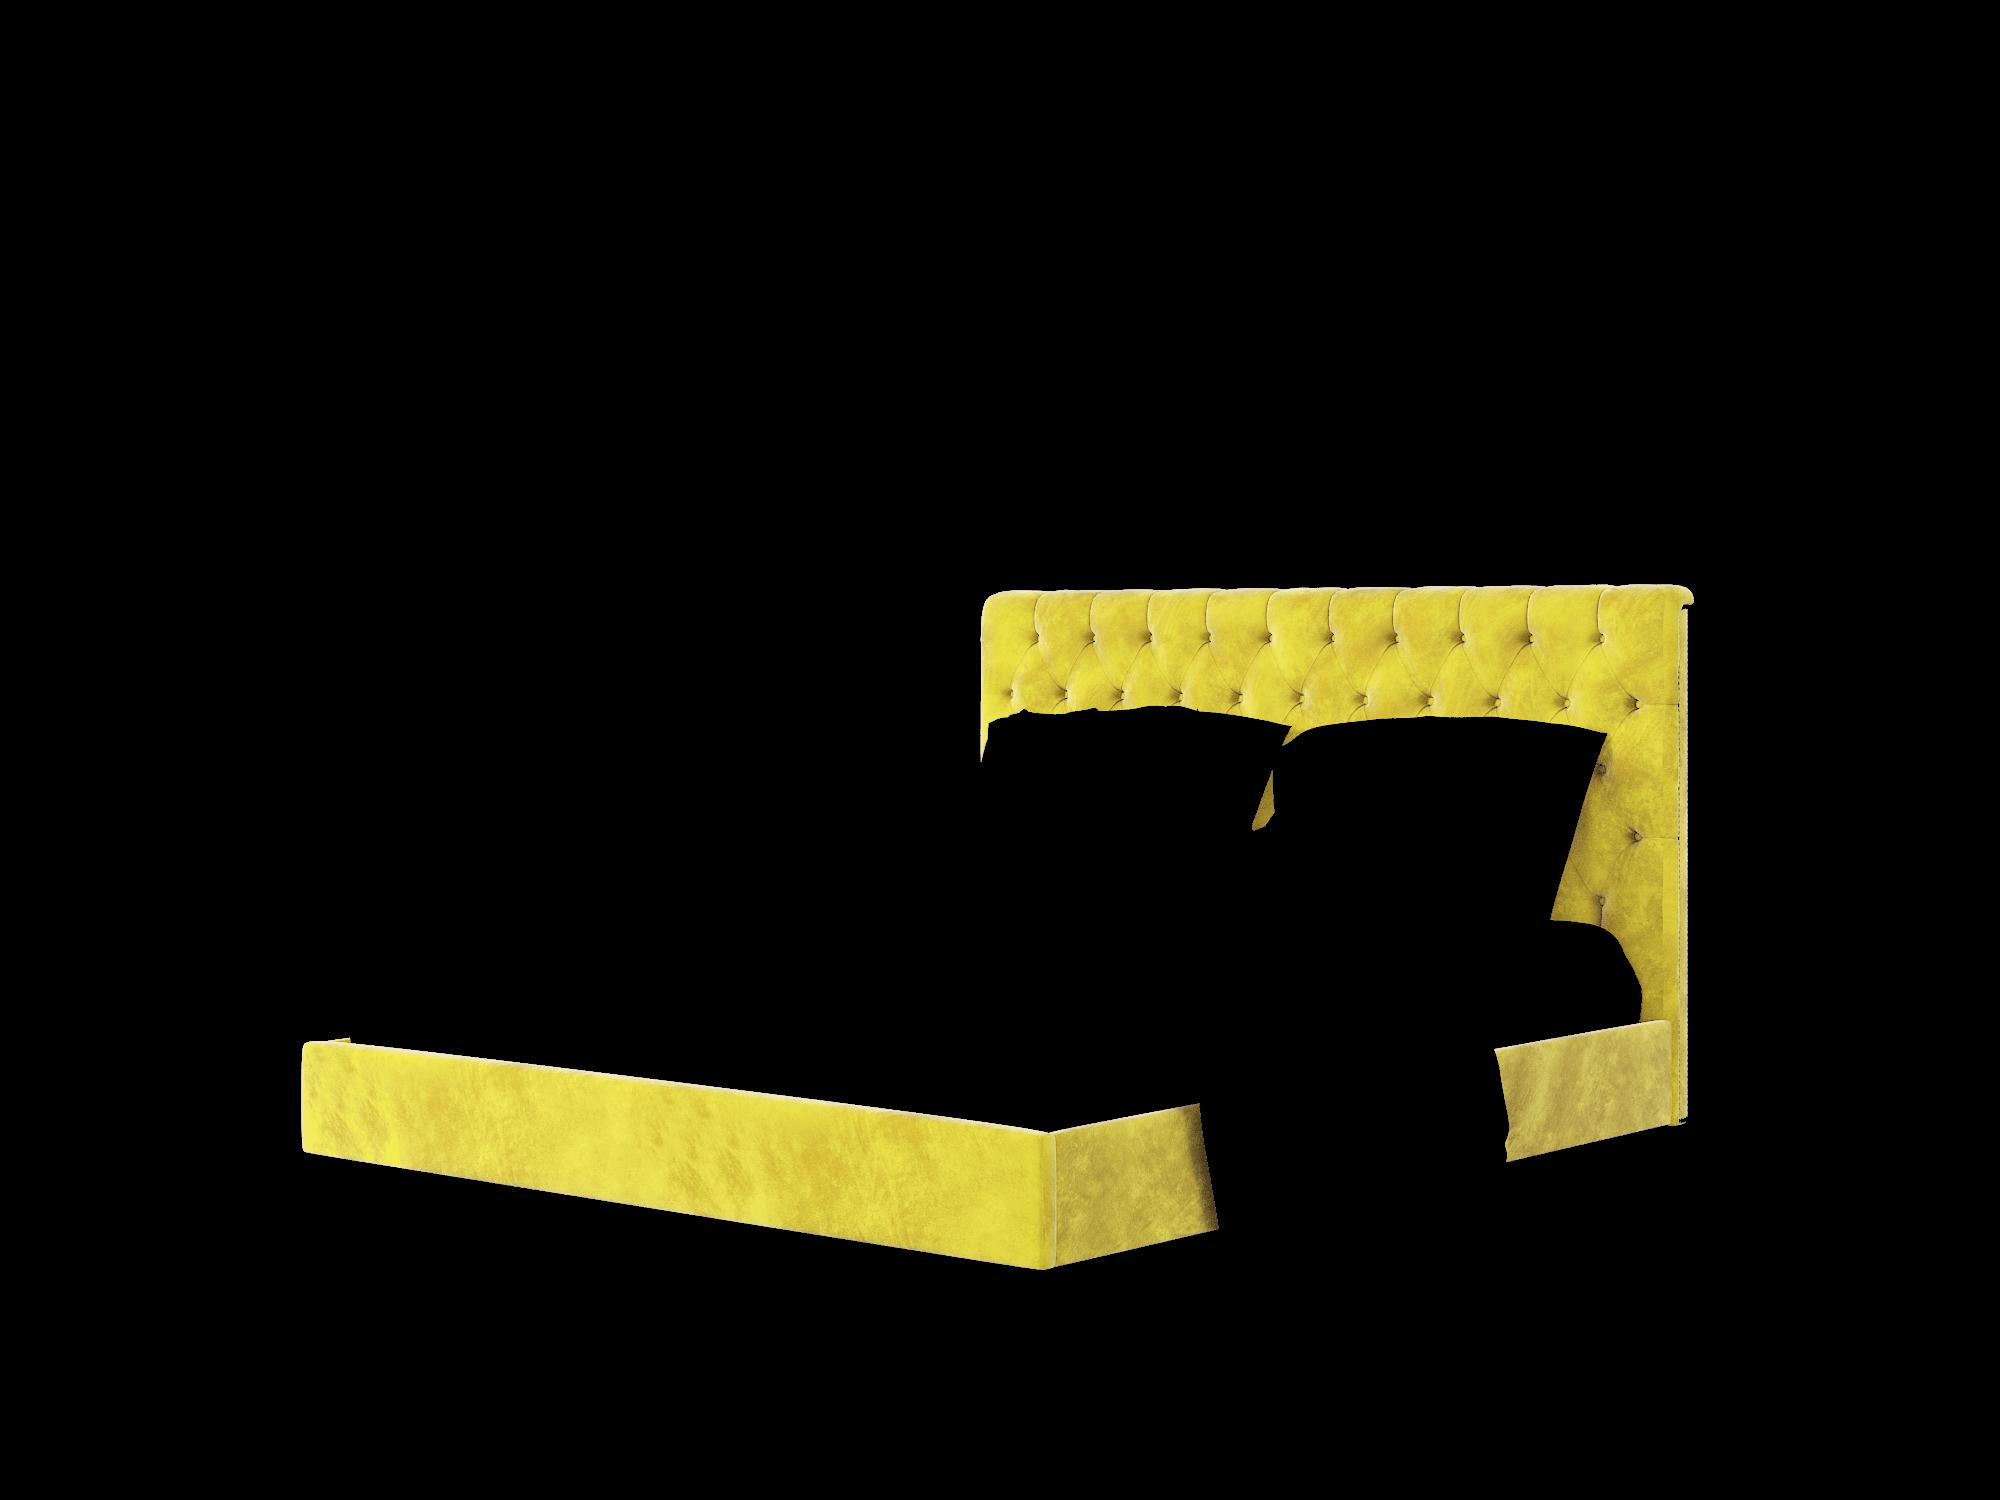 Remy Quartz 402 Bed King Room Texture